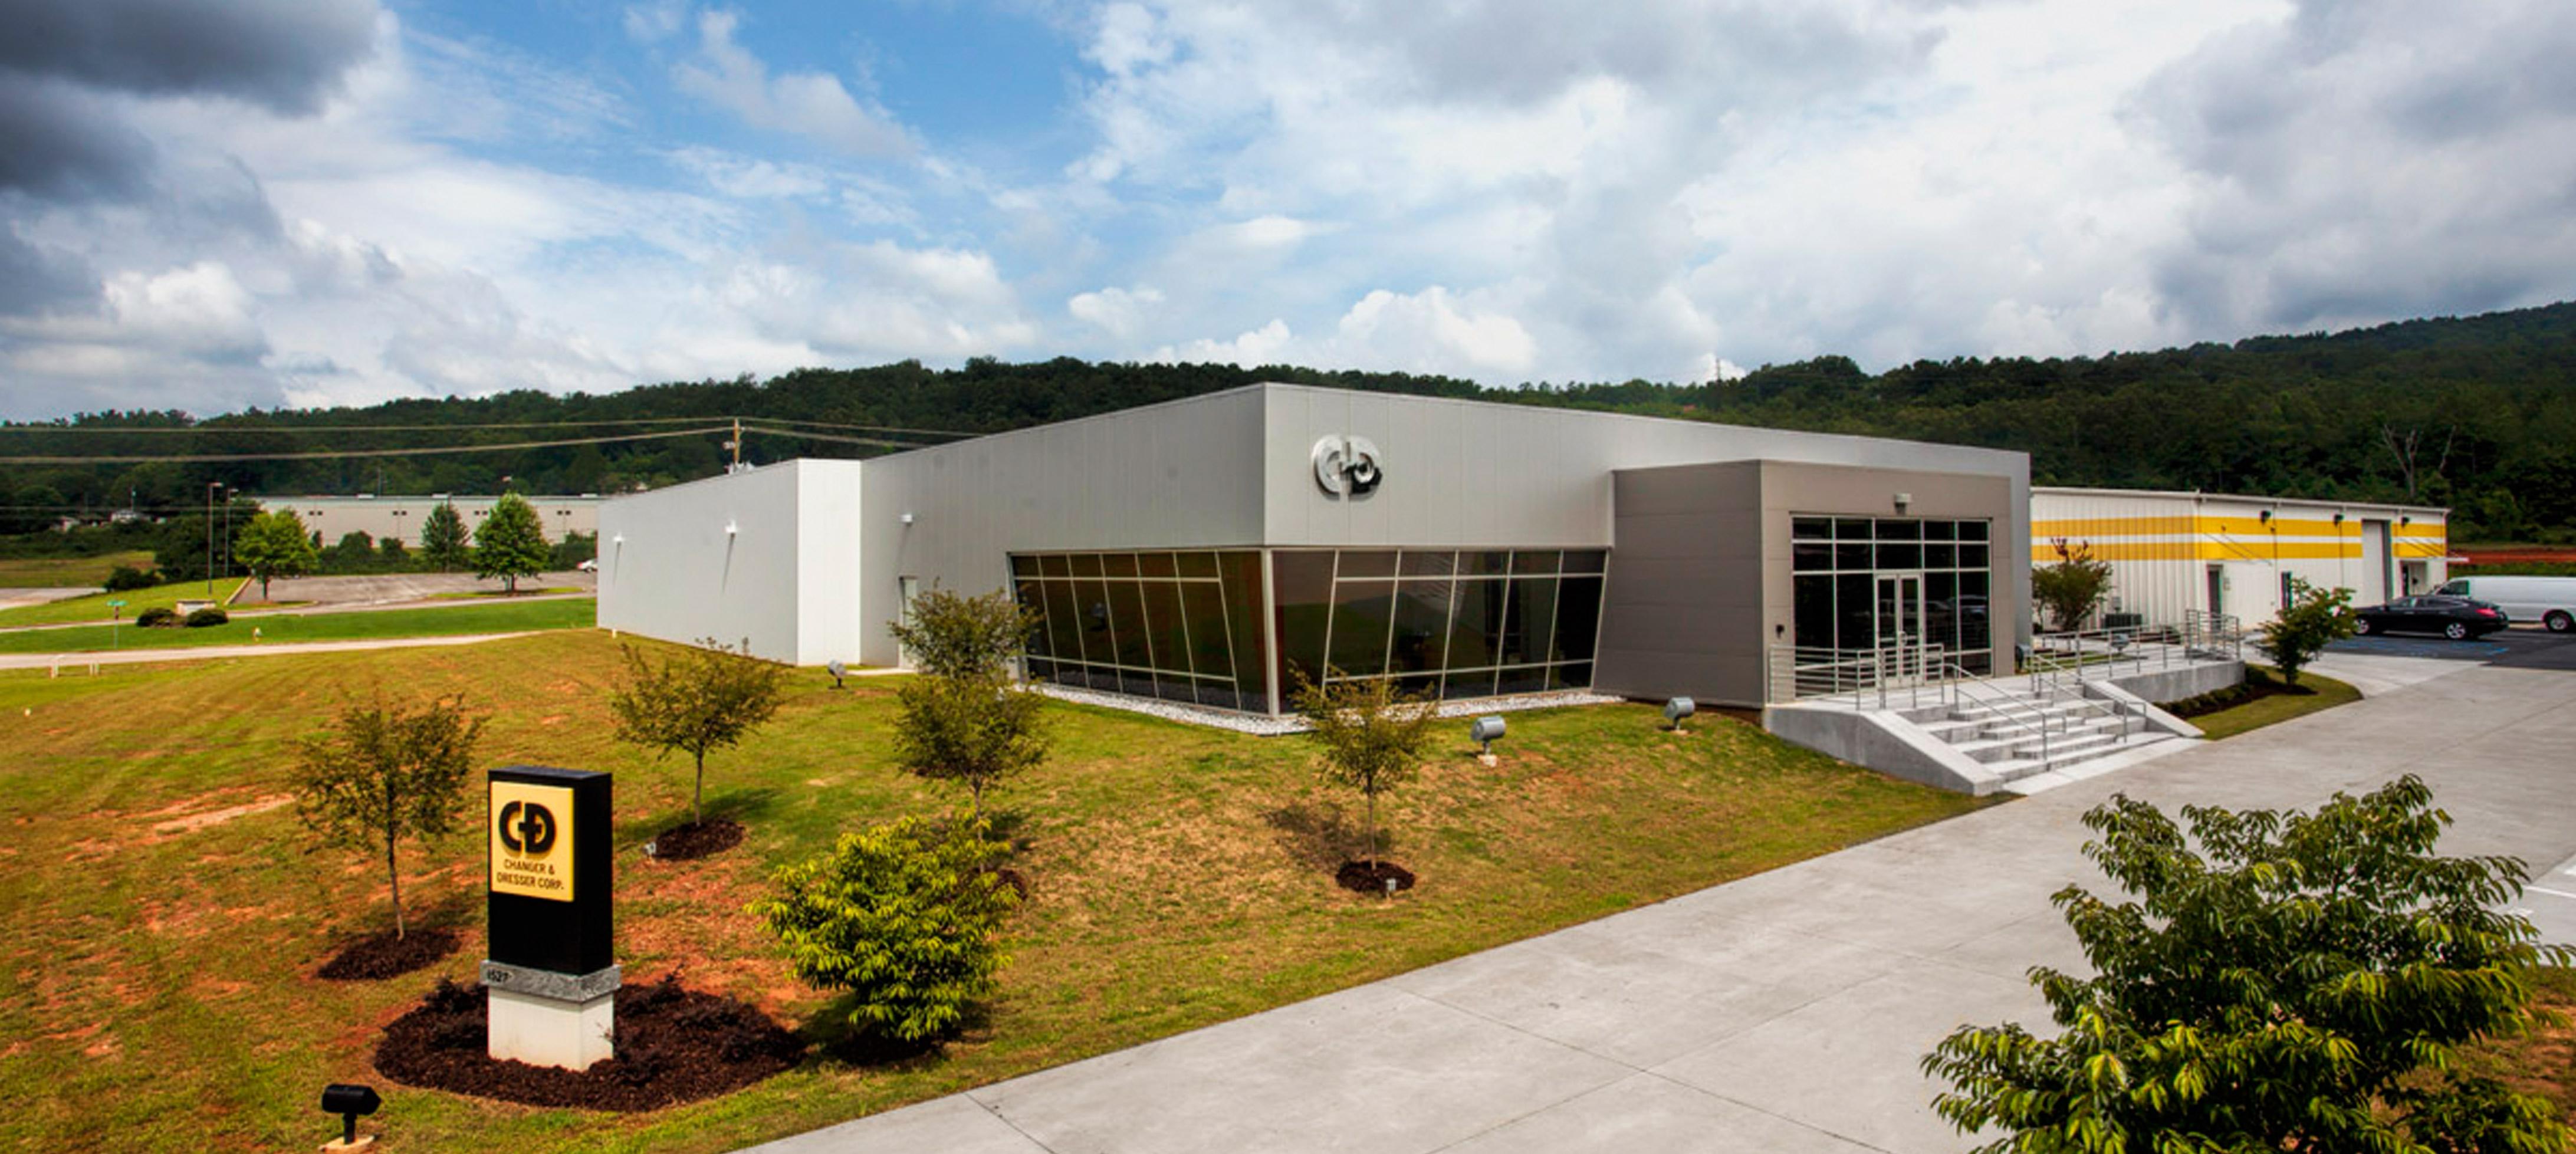 Home - Dunn Building Company